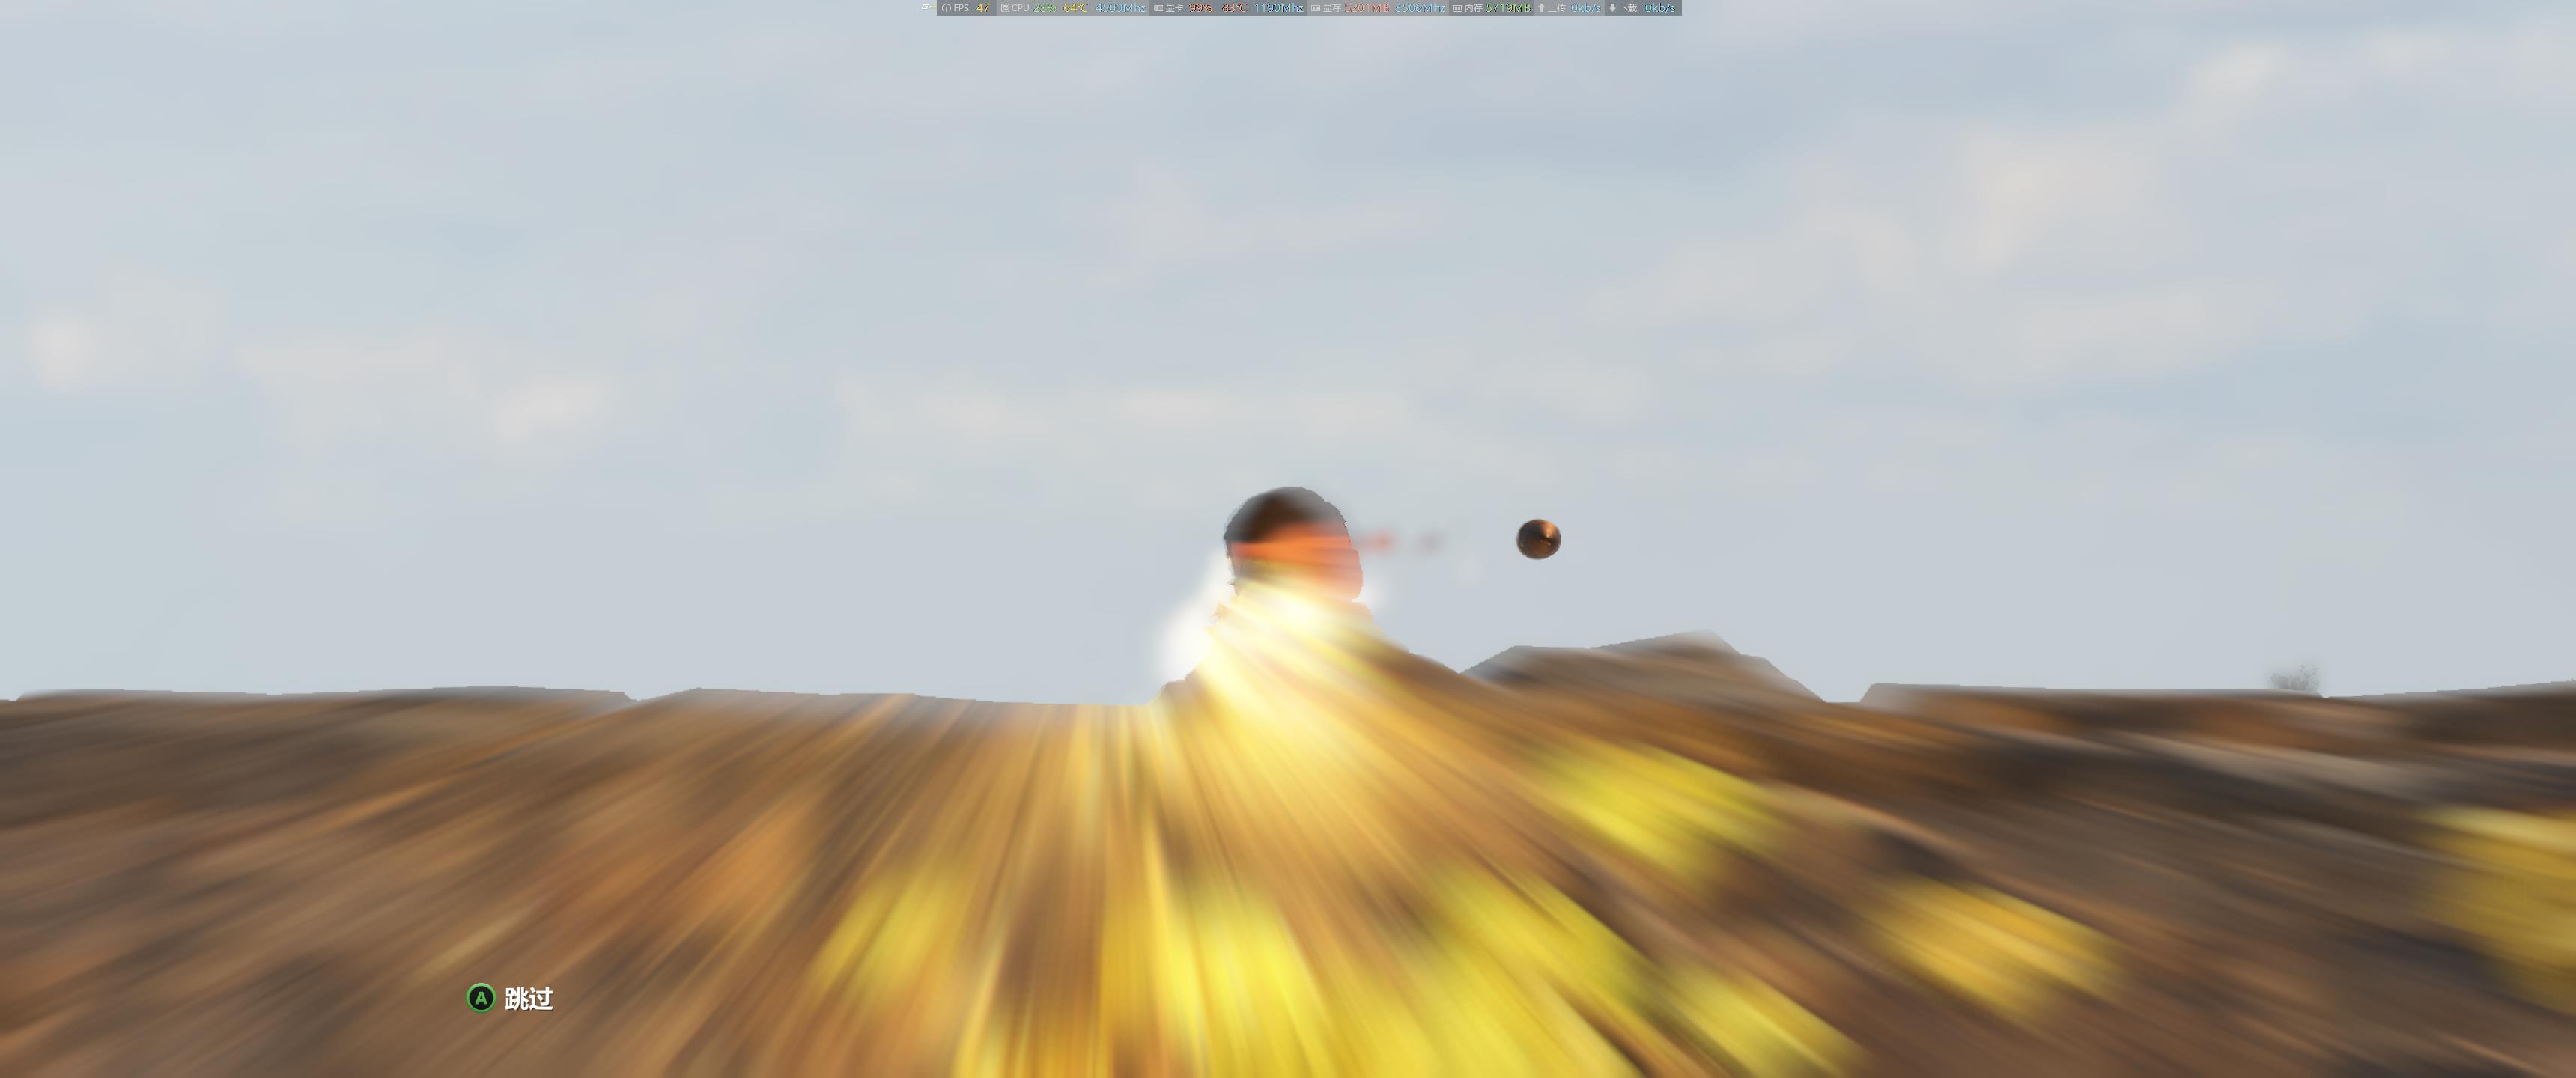 SniperElite4_DX11-25-12-53-47.jpg